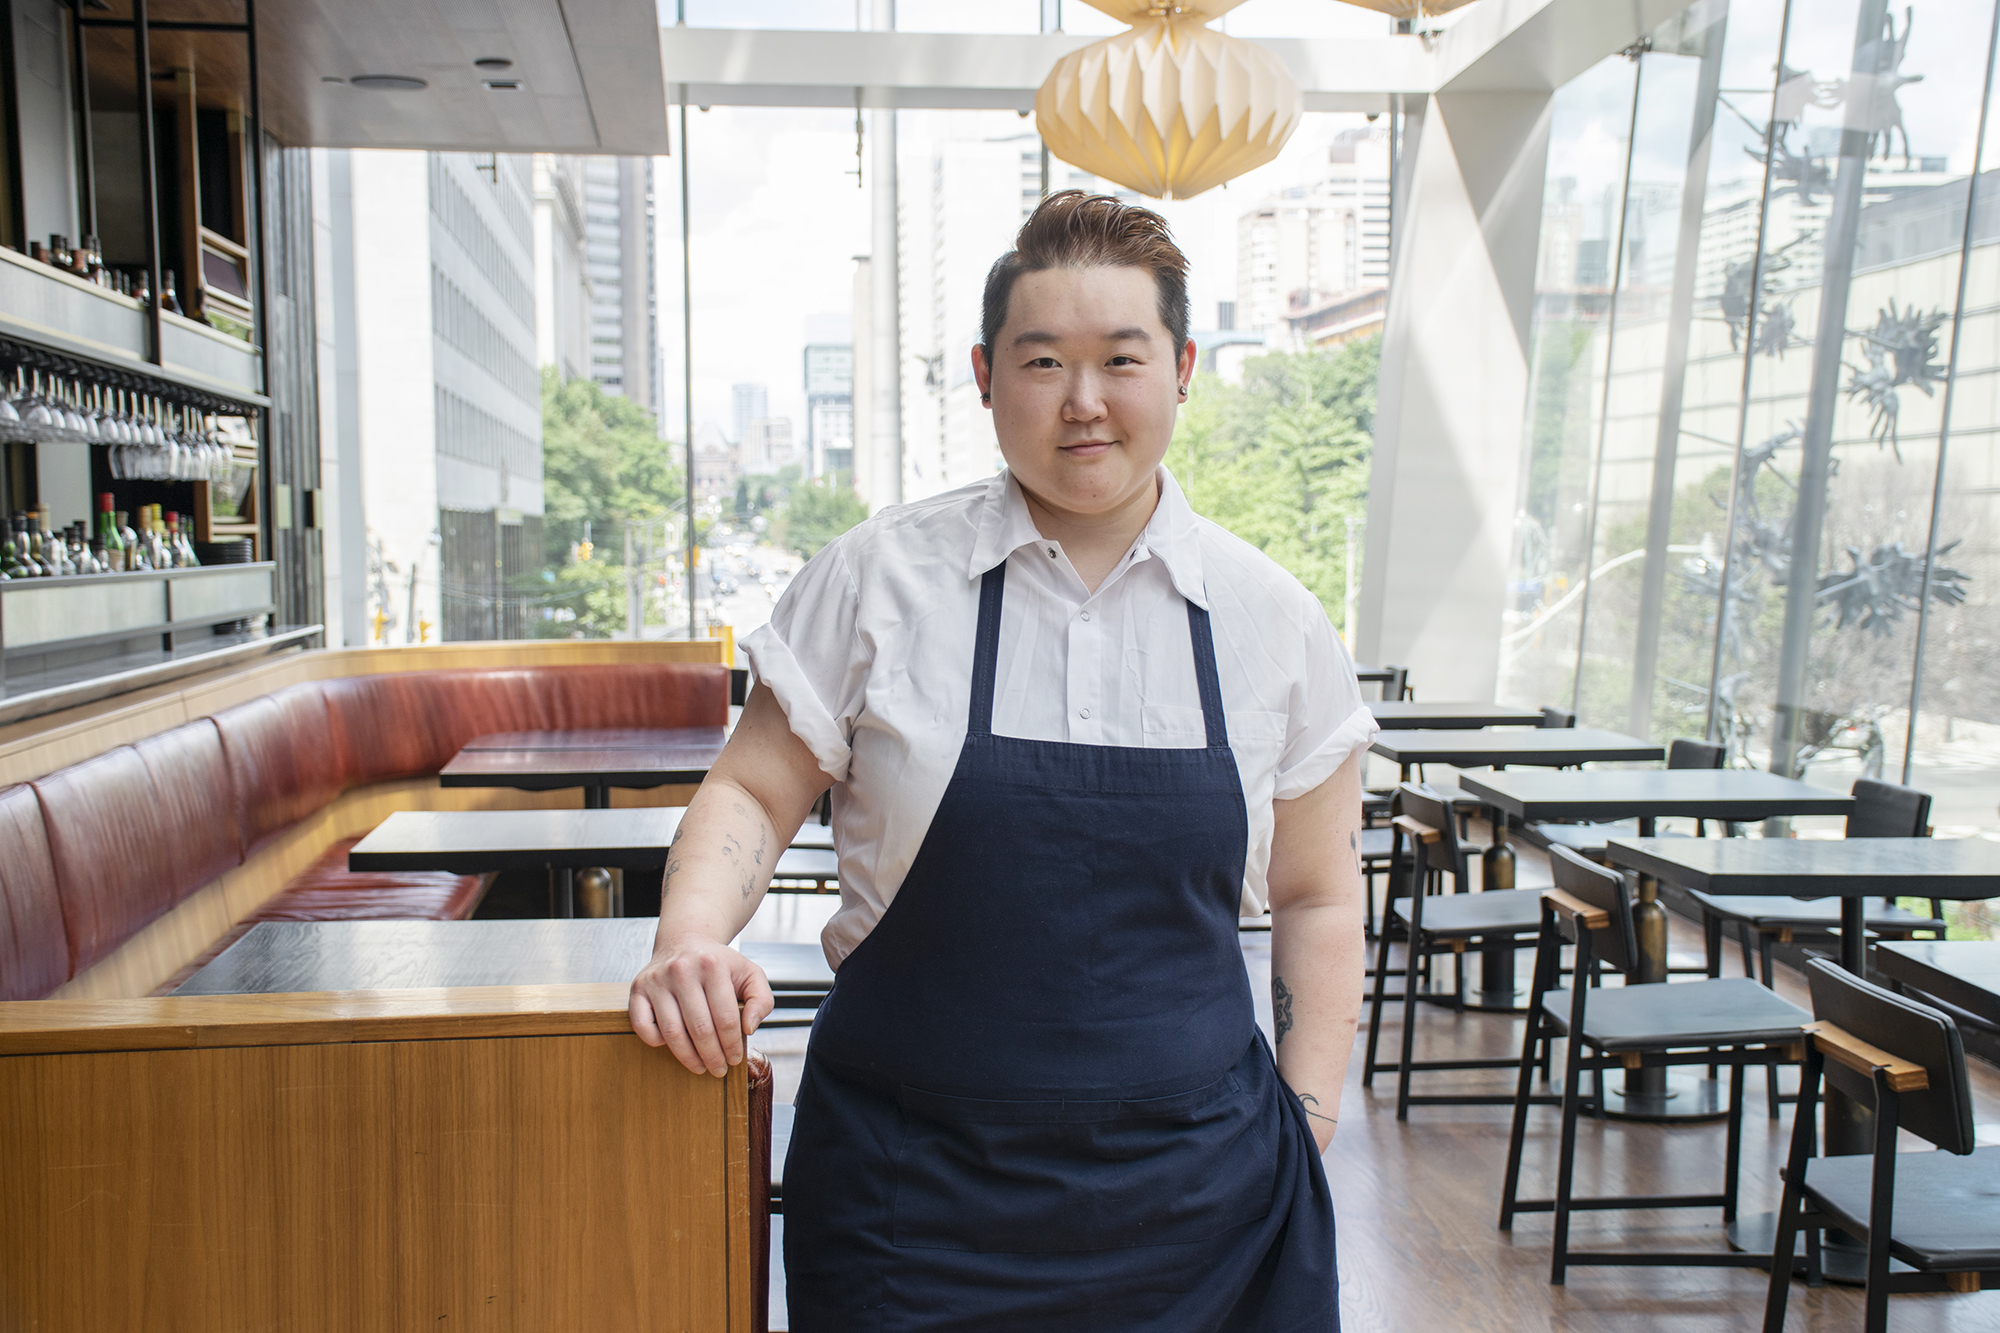 chef eva chin standing in kojin